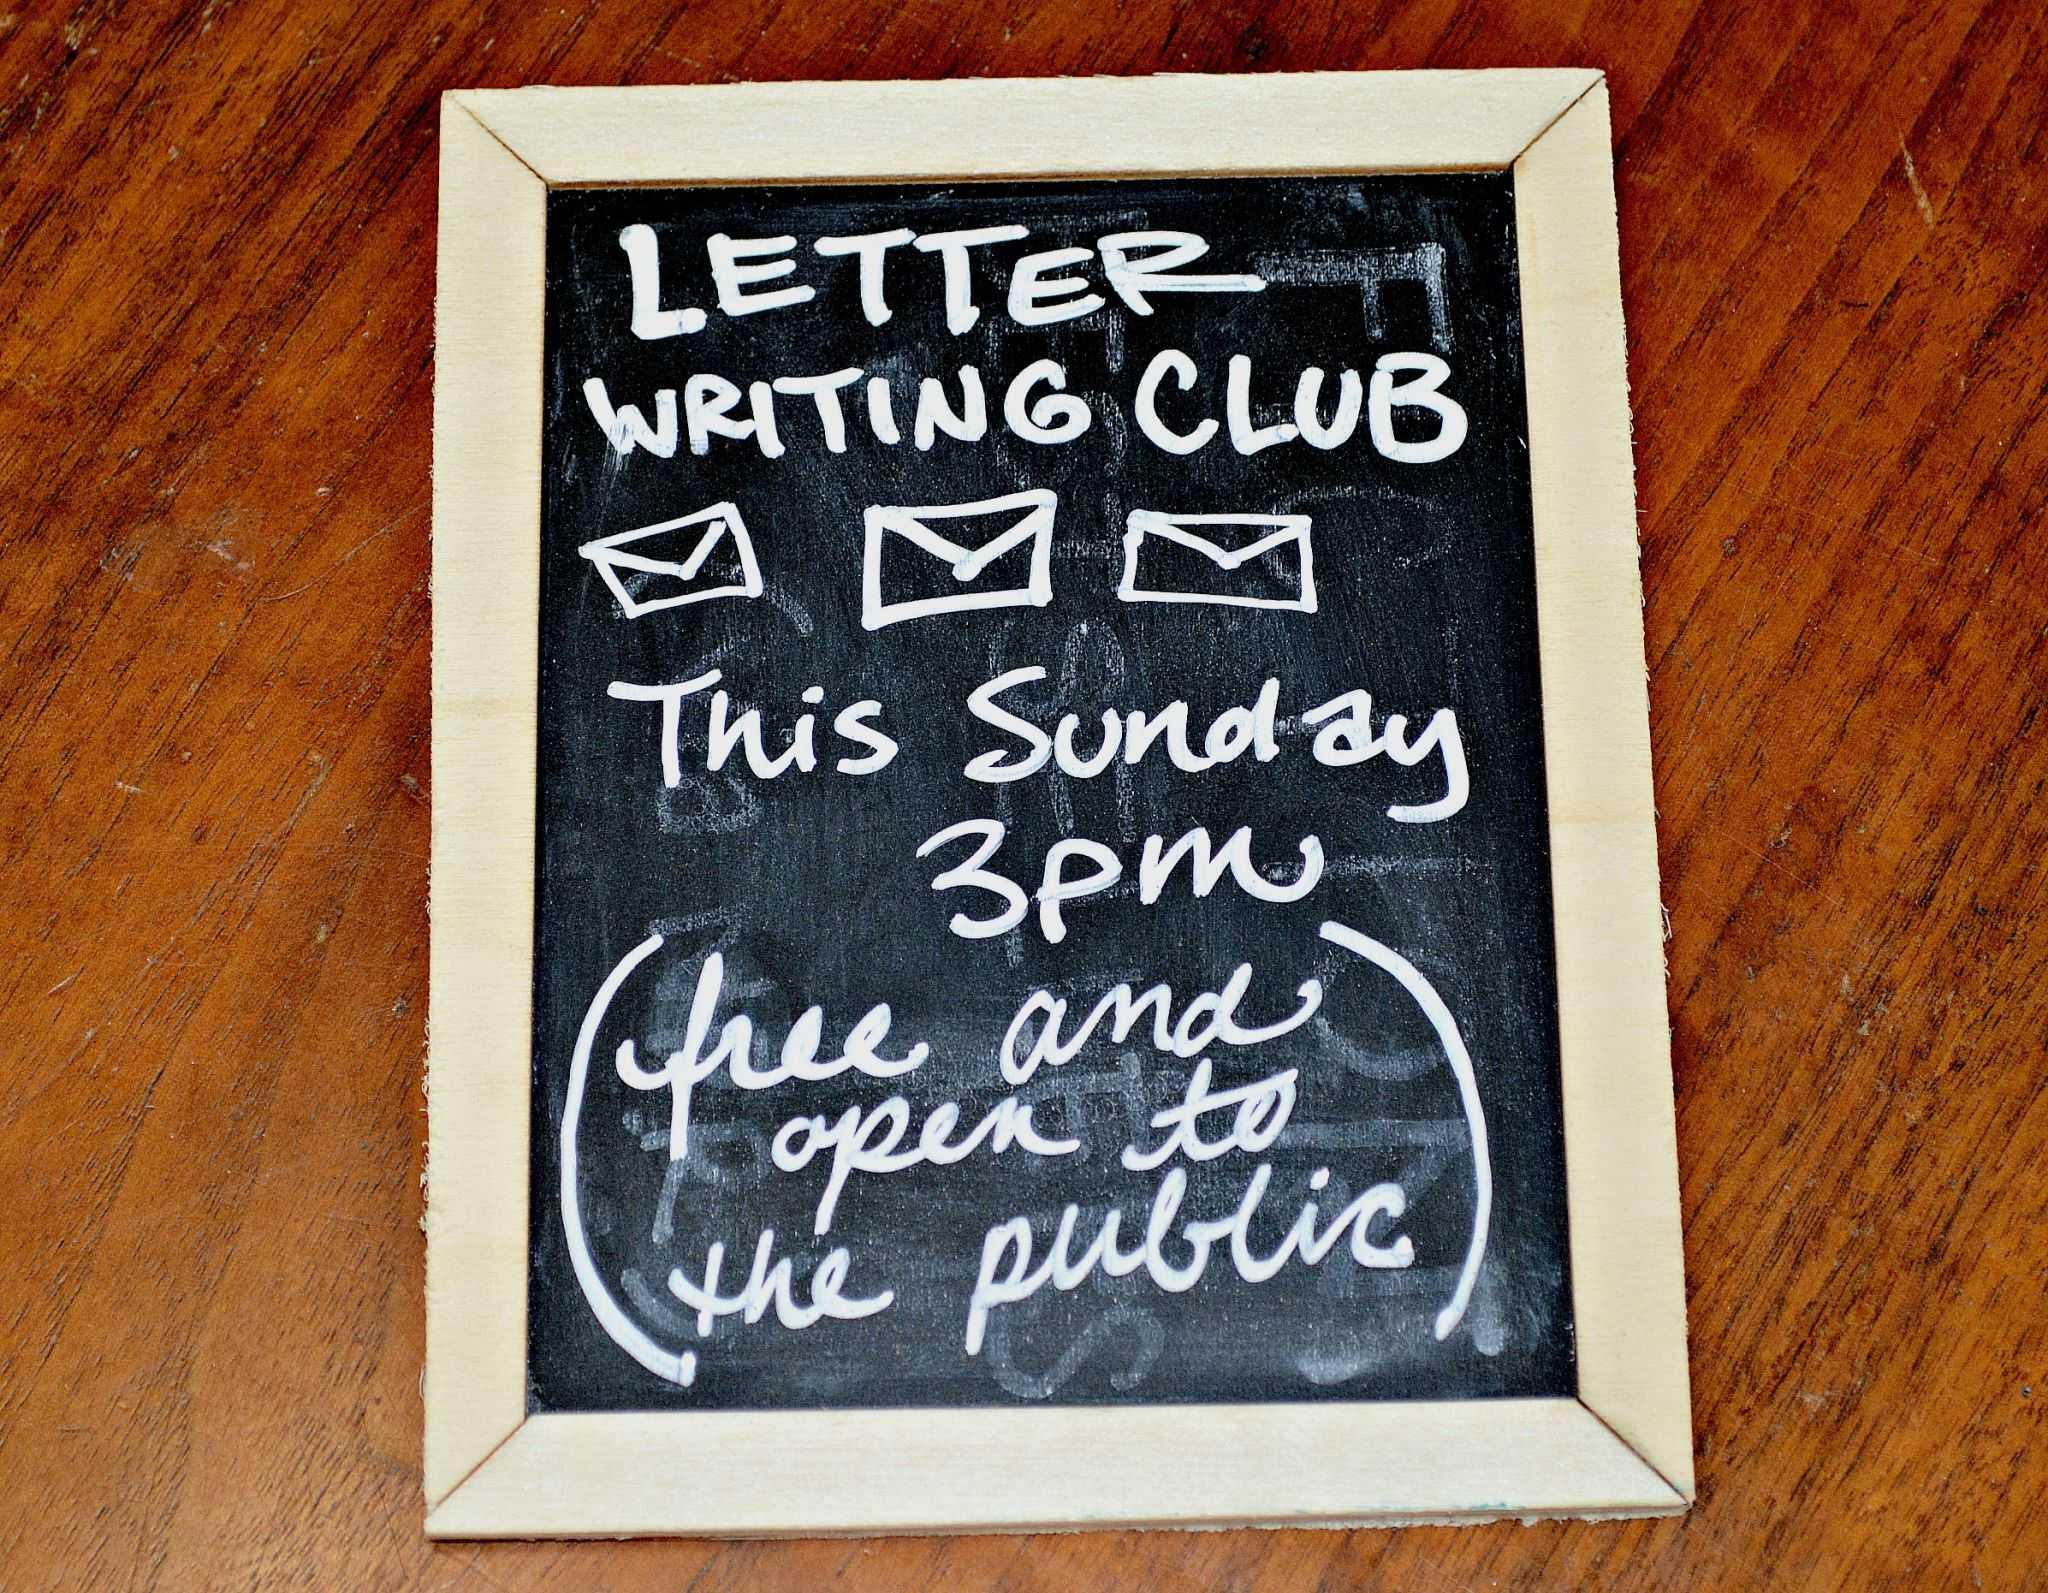 Letter Writing Club sign. Photo By: Randi Mattox